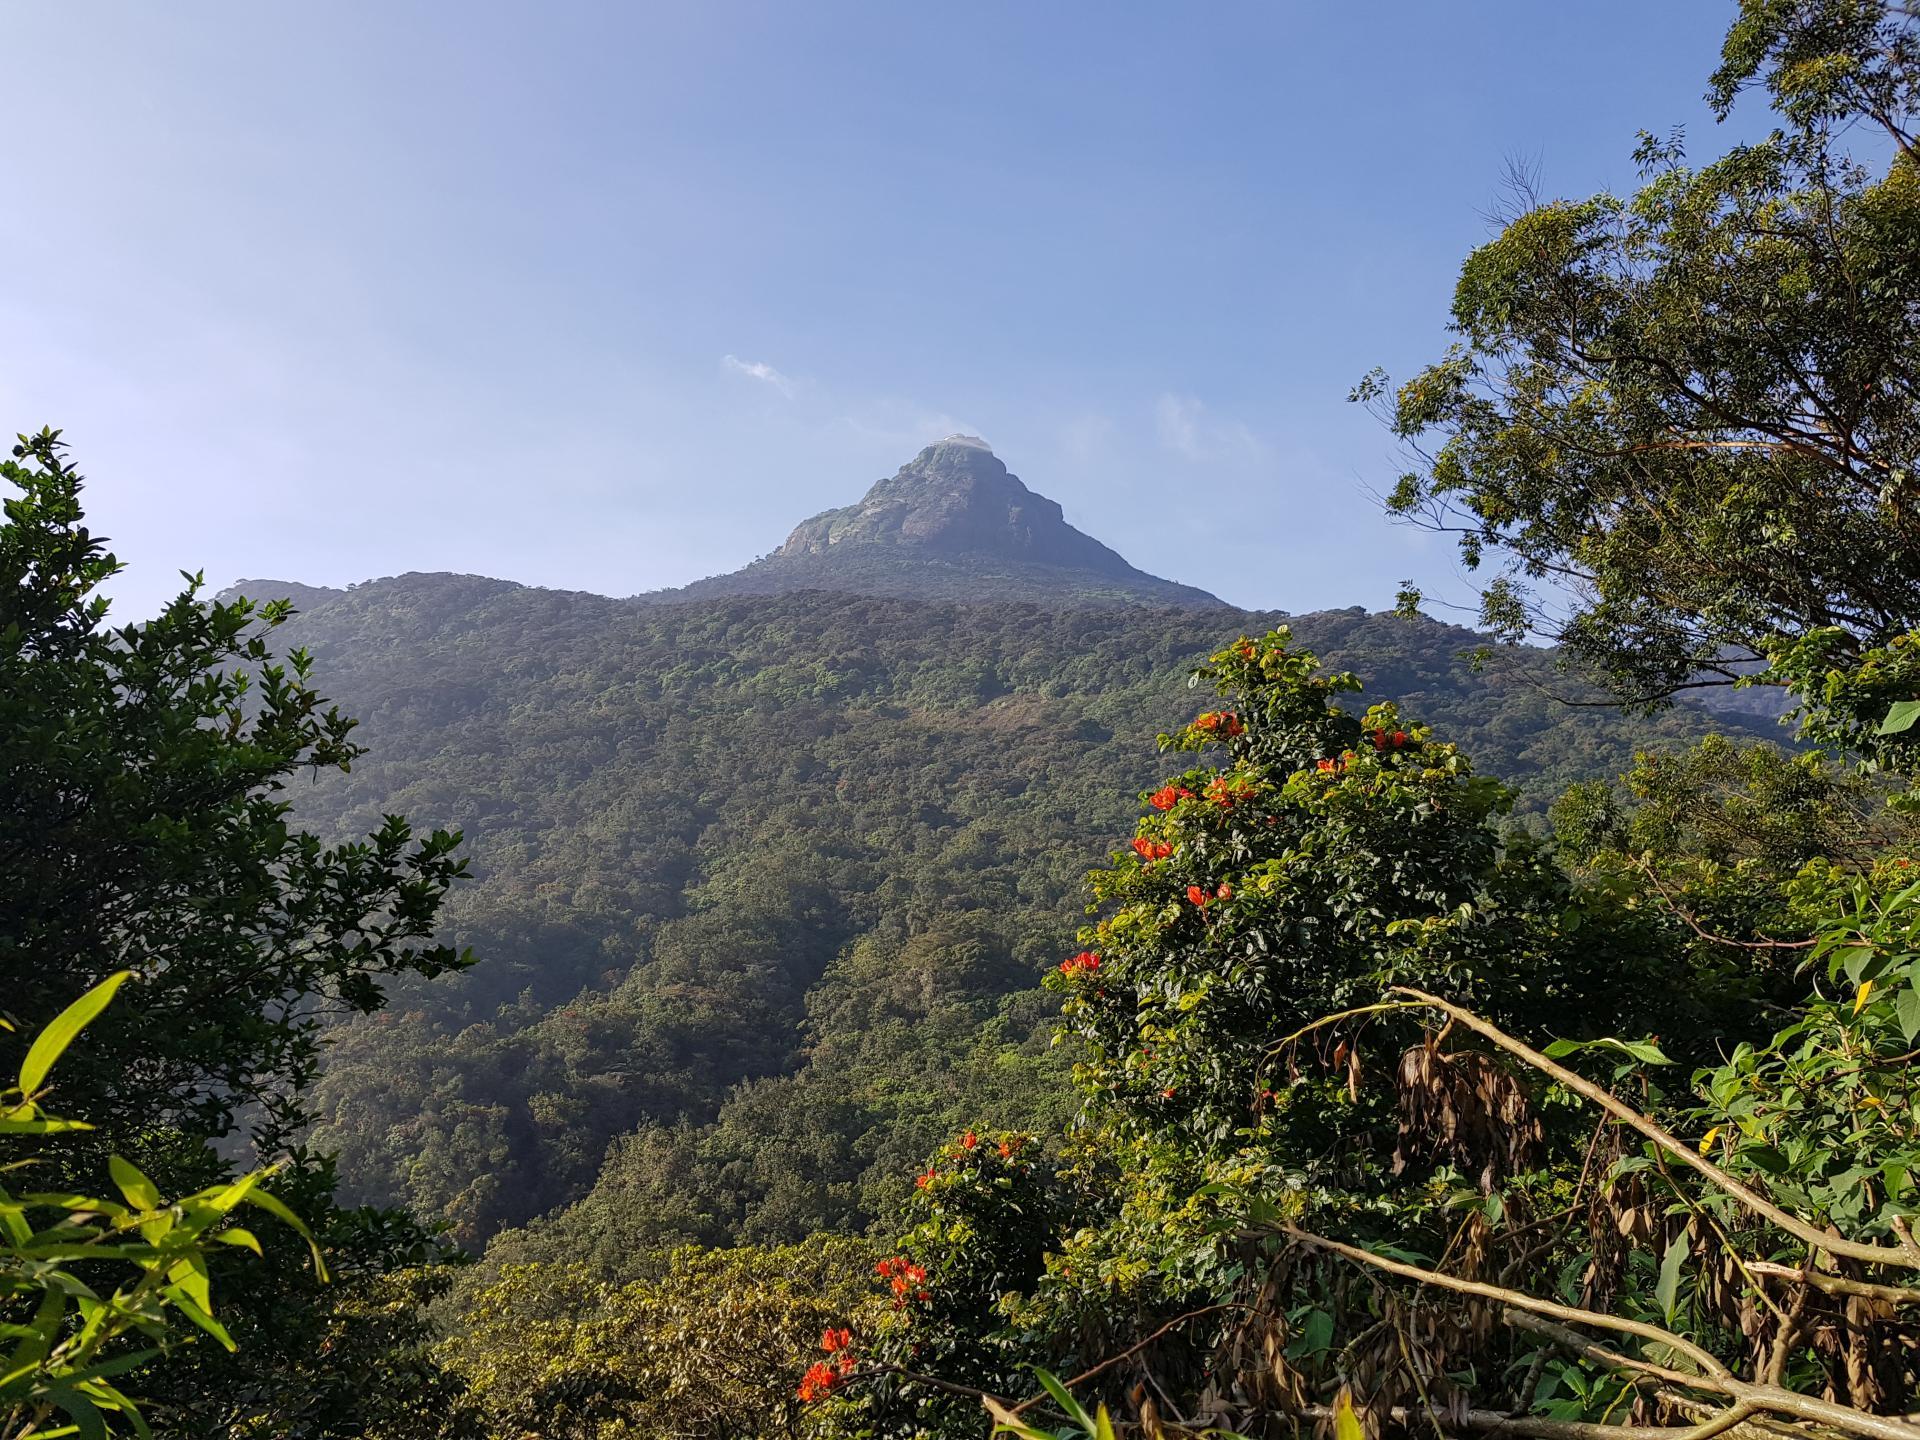 Пик Адама, Шри-Ланка.